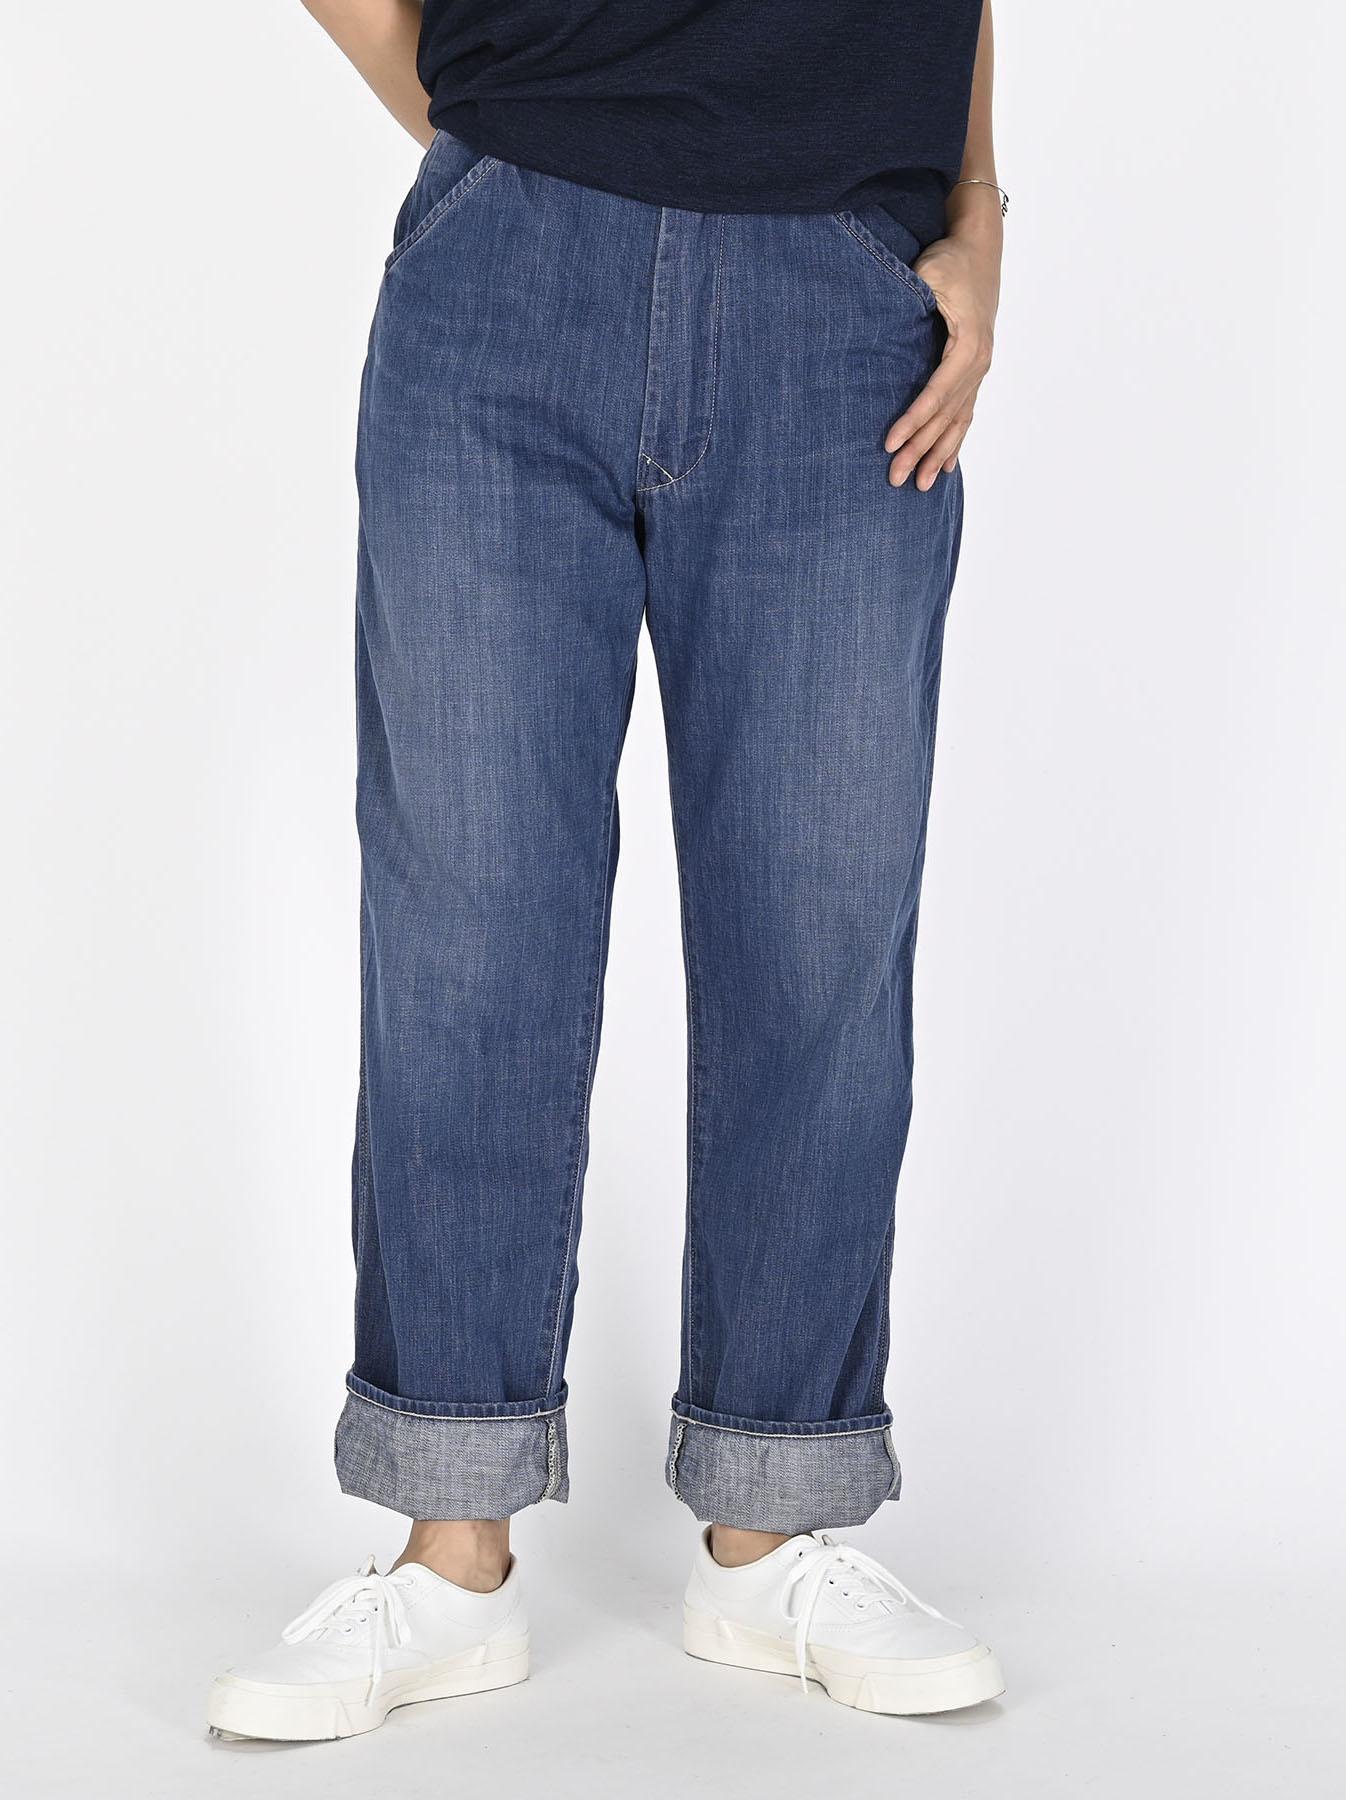 Indigo 908 Painter Pants Distressed (0721)-3